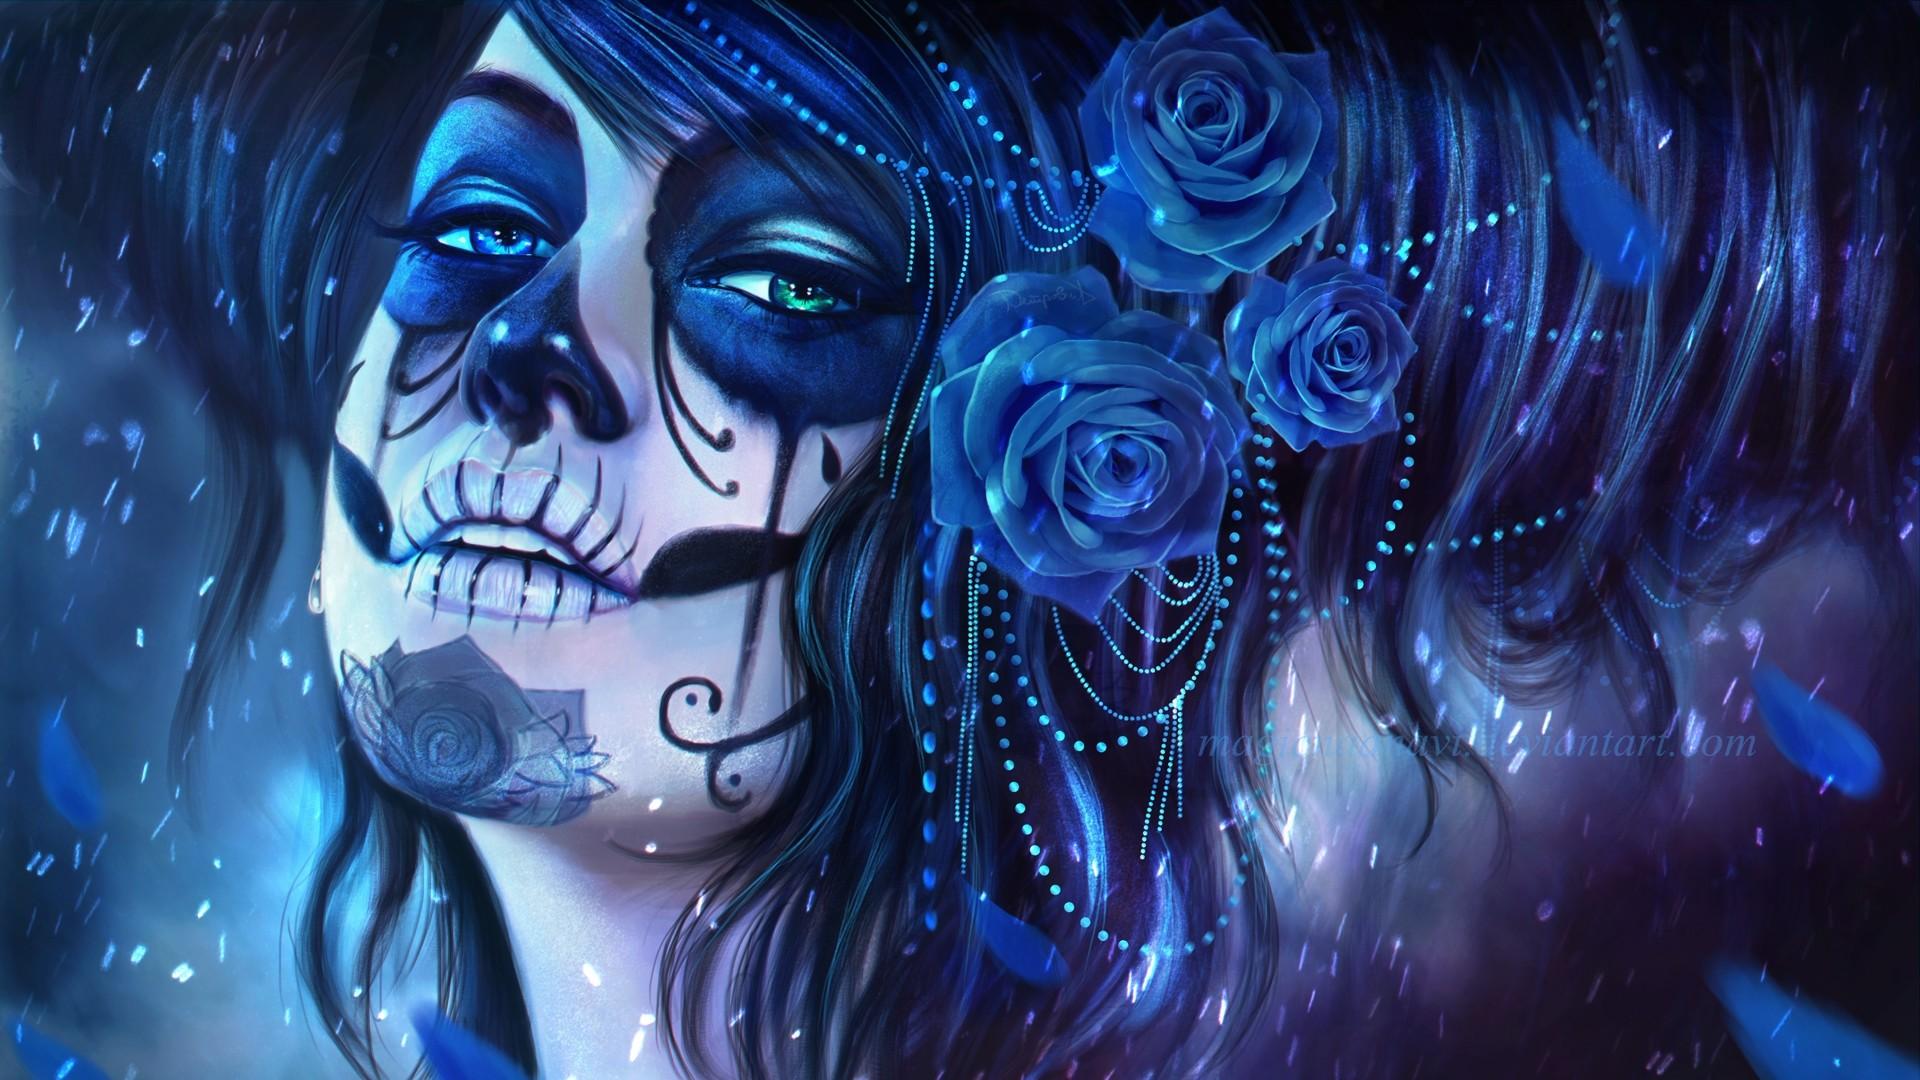 Dead Rose a wallpaper